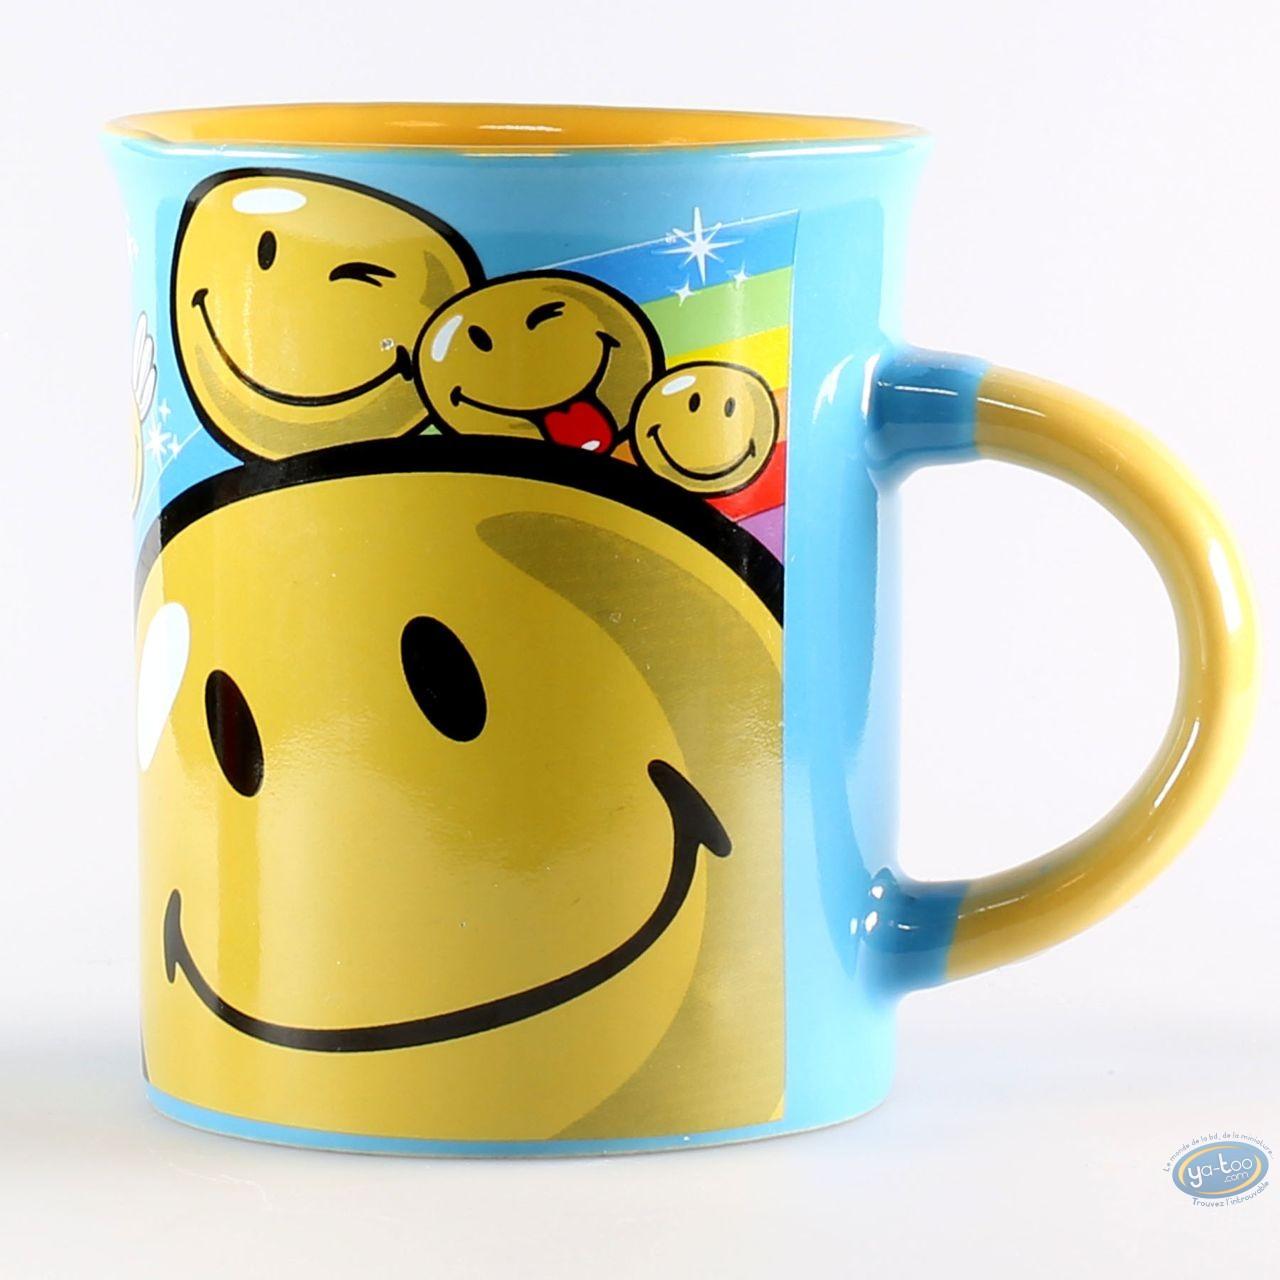 Tableware, Smiley : Ceramic mug, Smiley